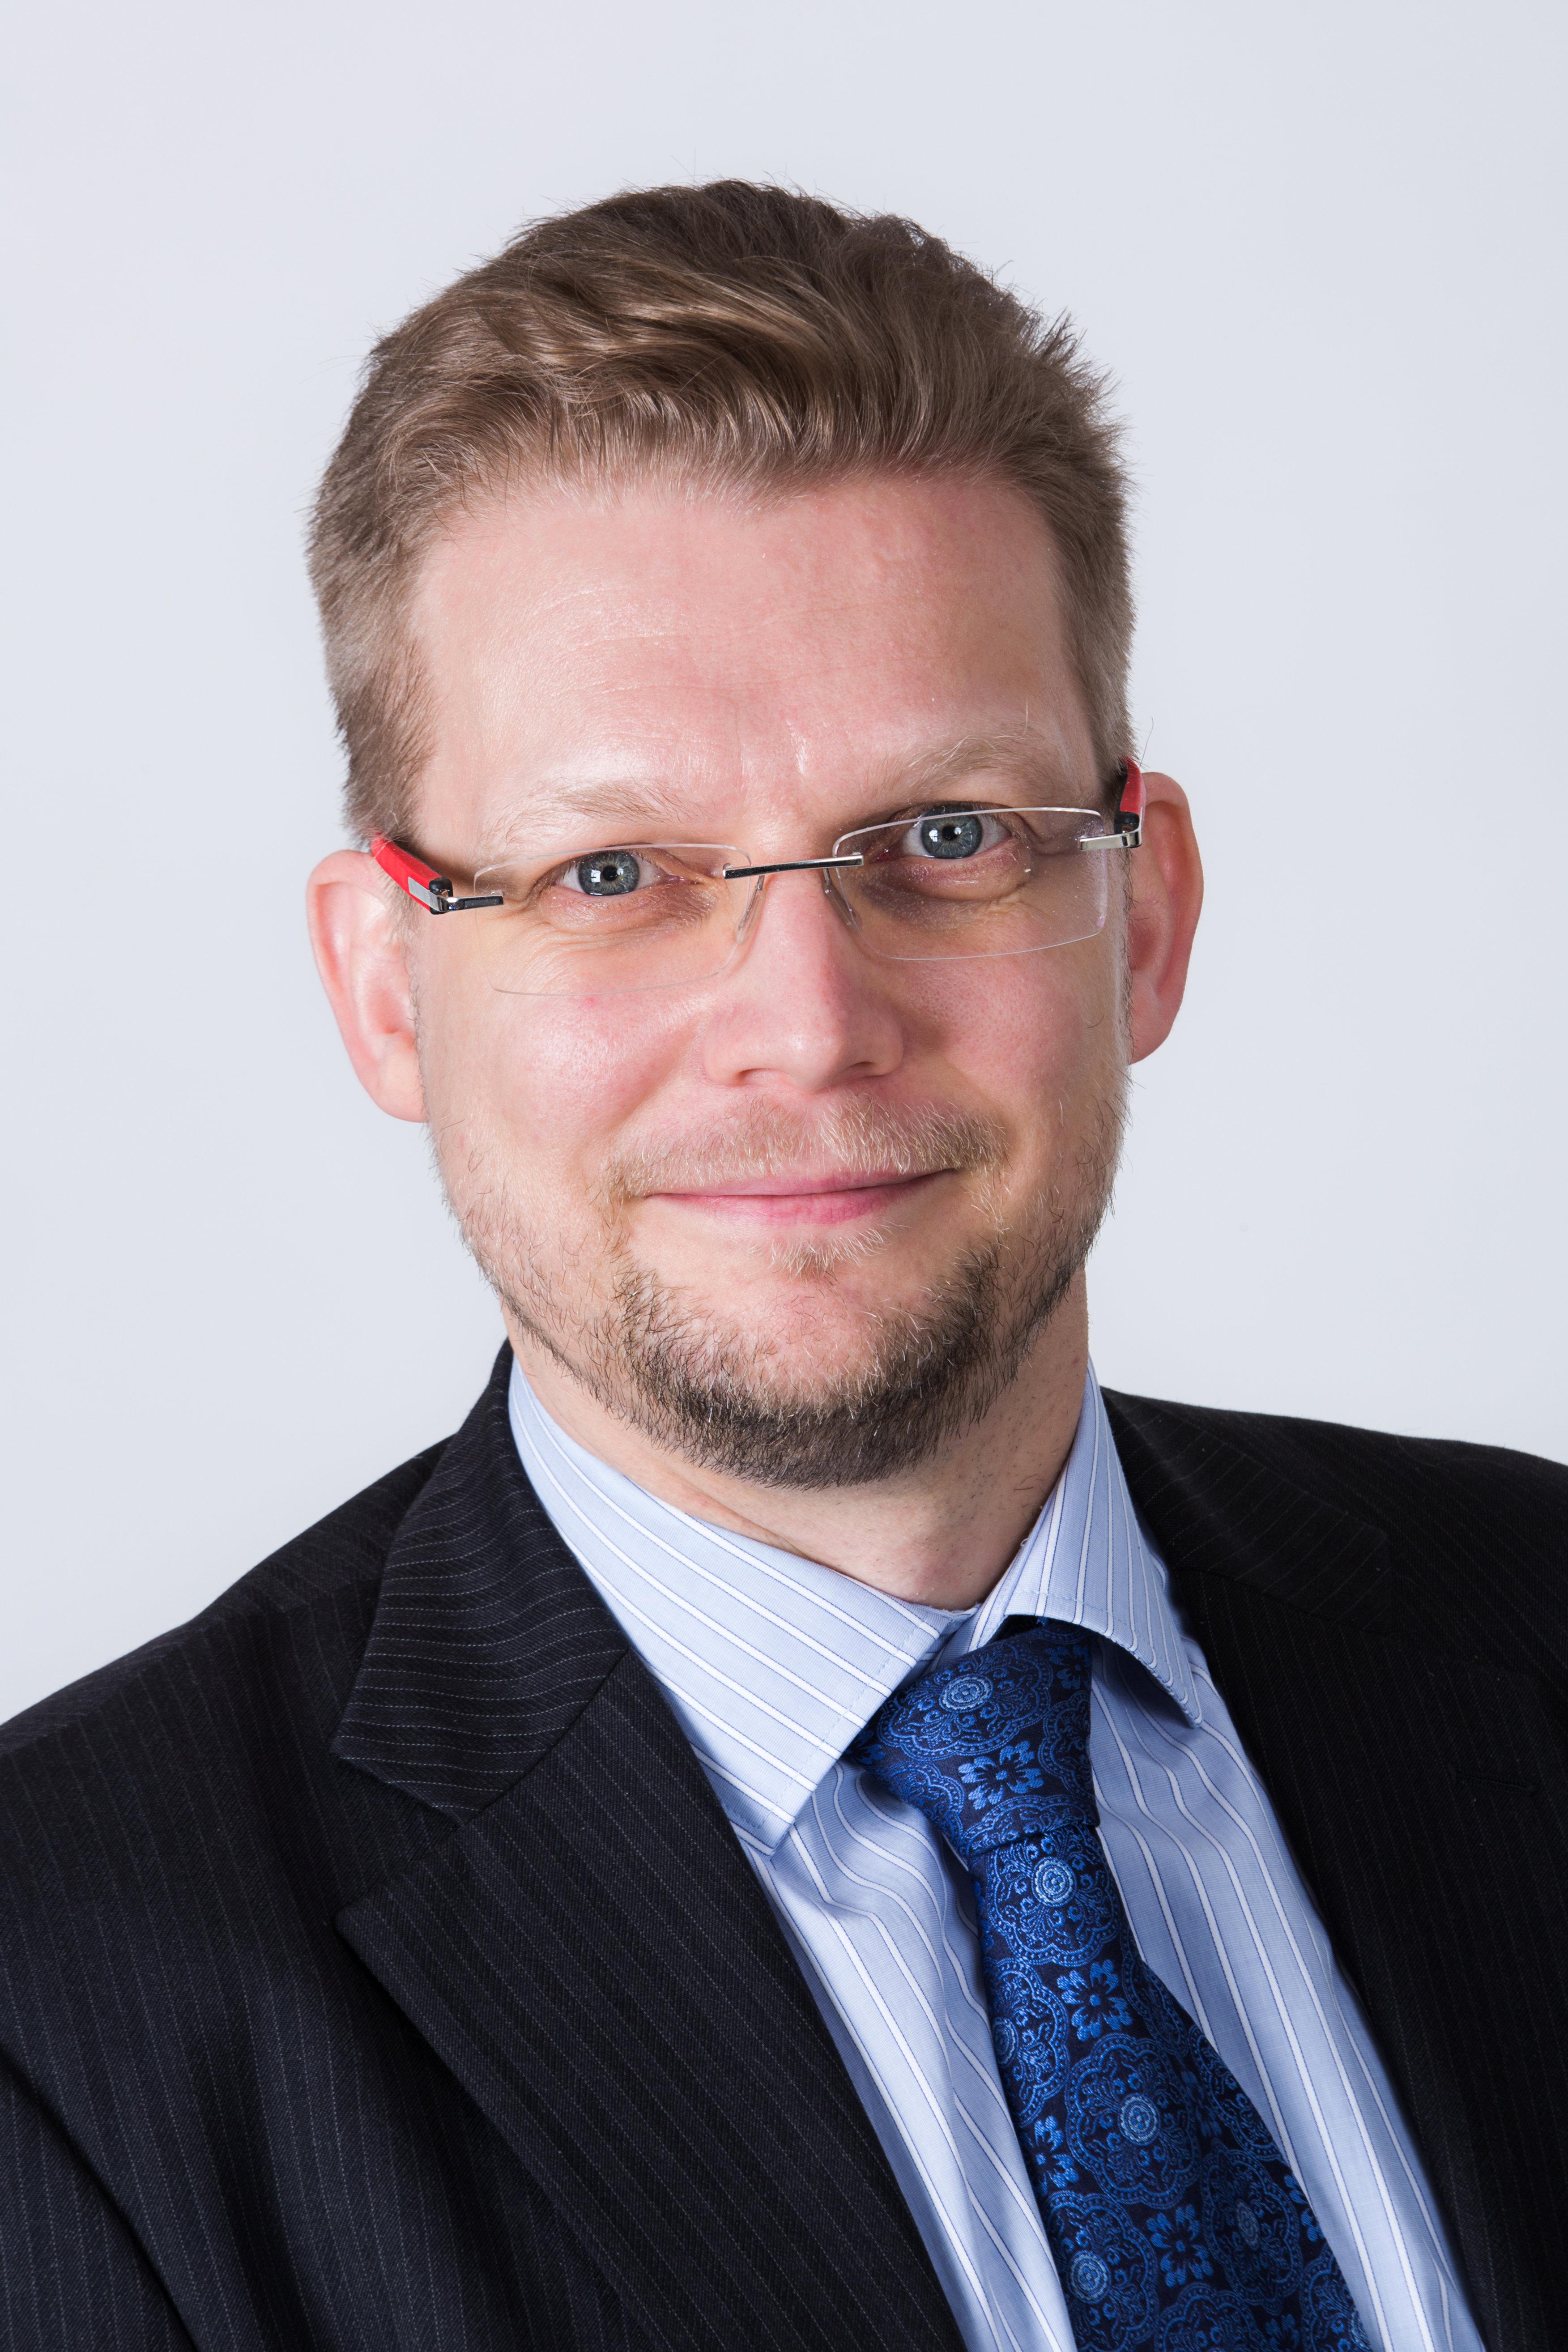 Thomas Heide Clausen, cand.polyt, PhD : Professor